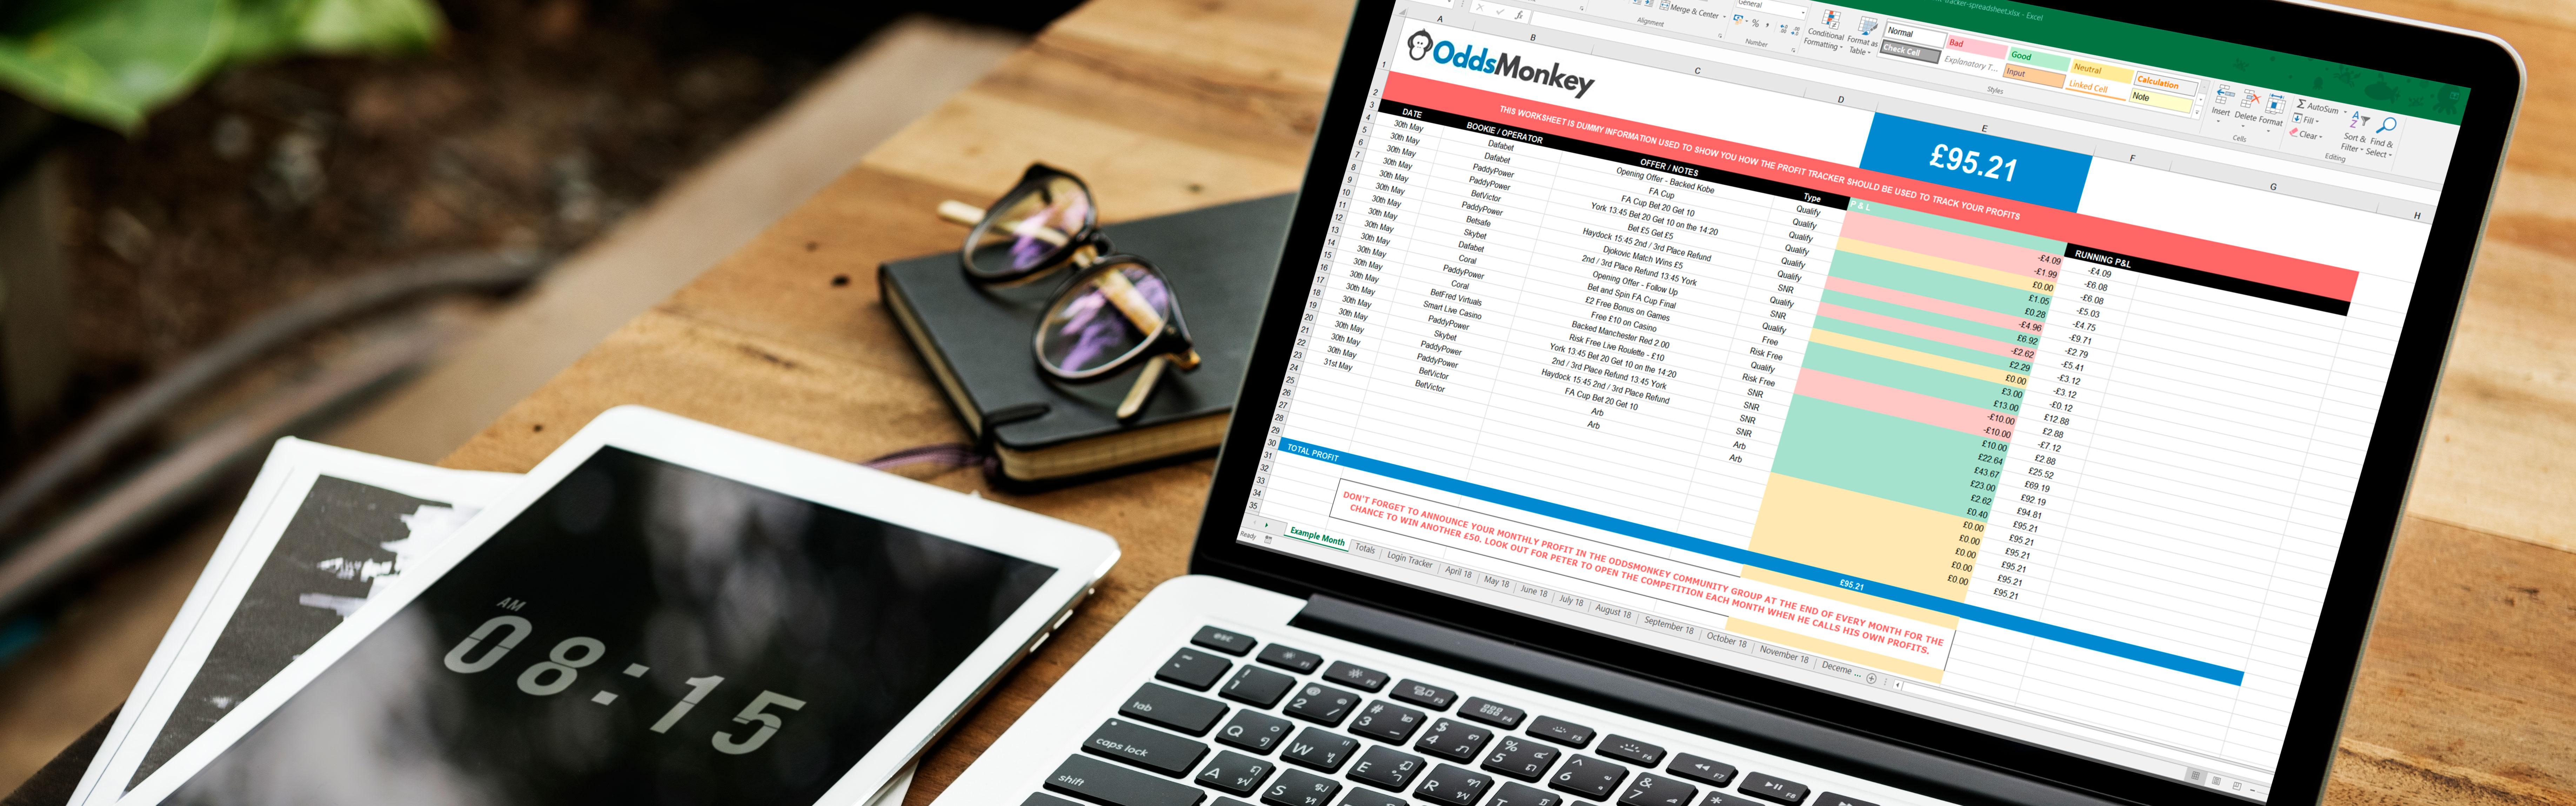 Oddsmonkey Spreadsheet Throughout Free Matched Betting Spreadsheet  Oddsmonkey Blog